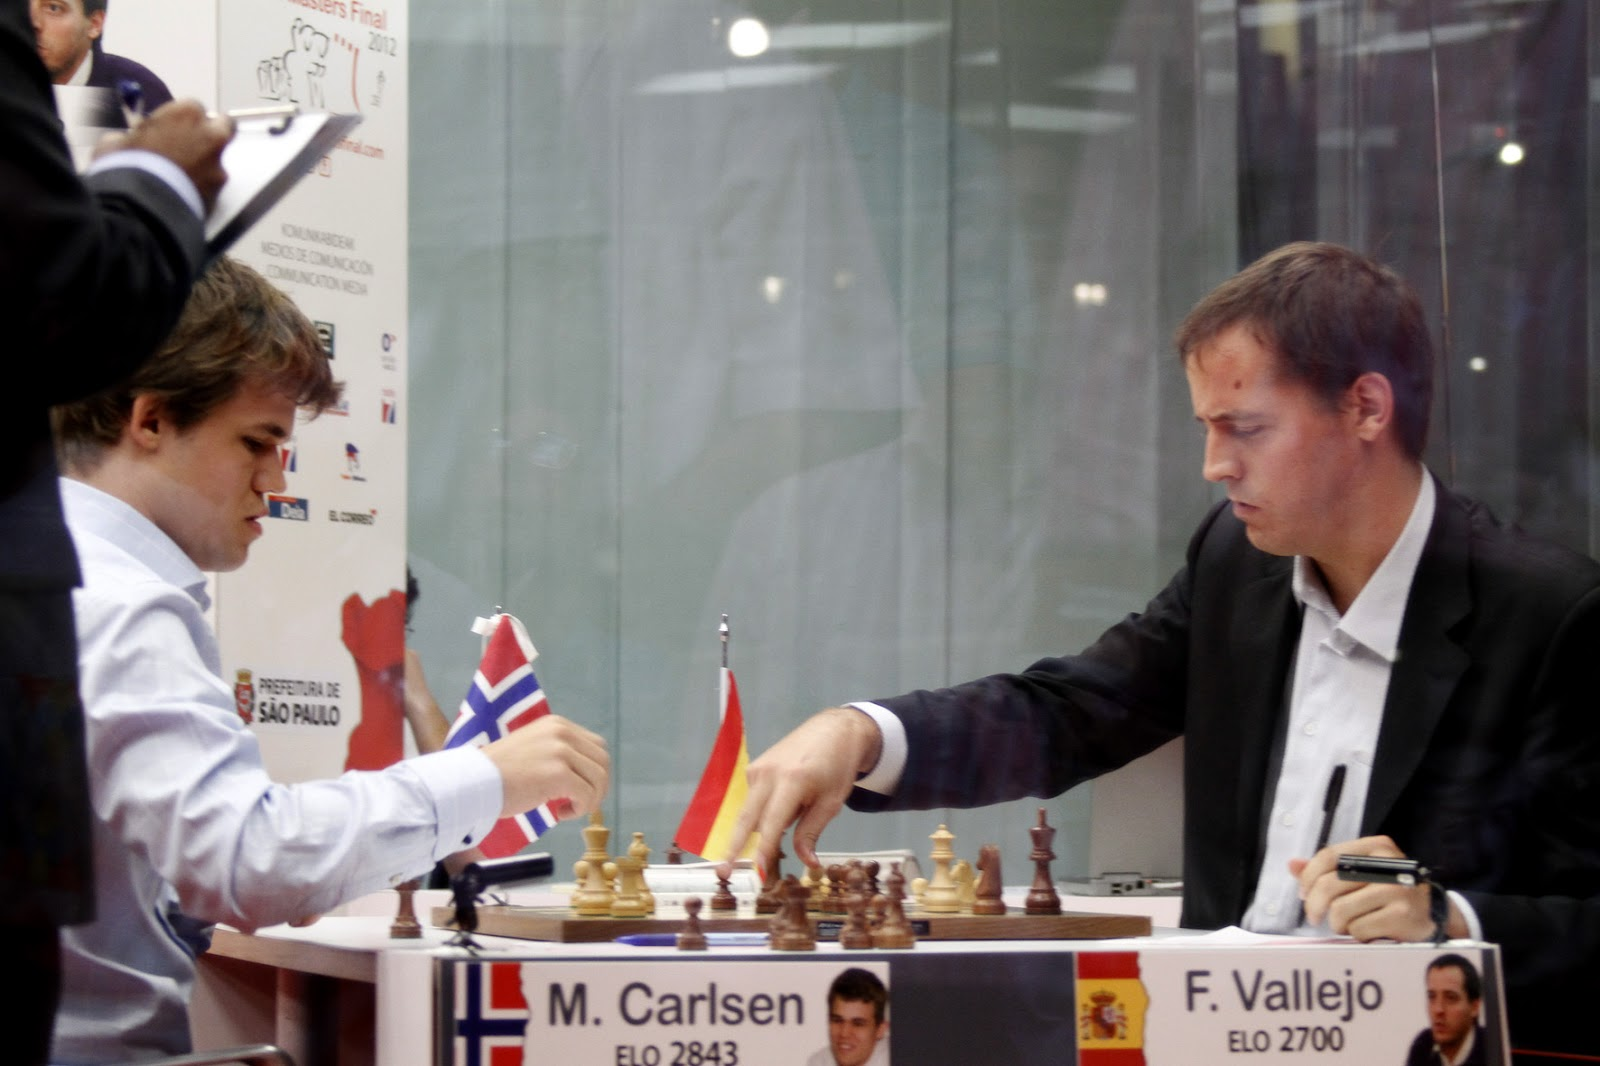 Aronian-Carlsen bilbao chess masters 2012